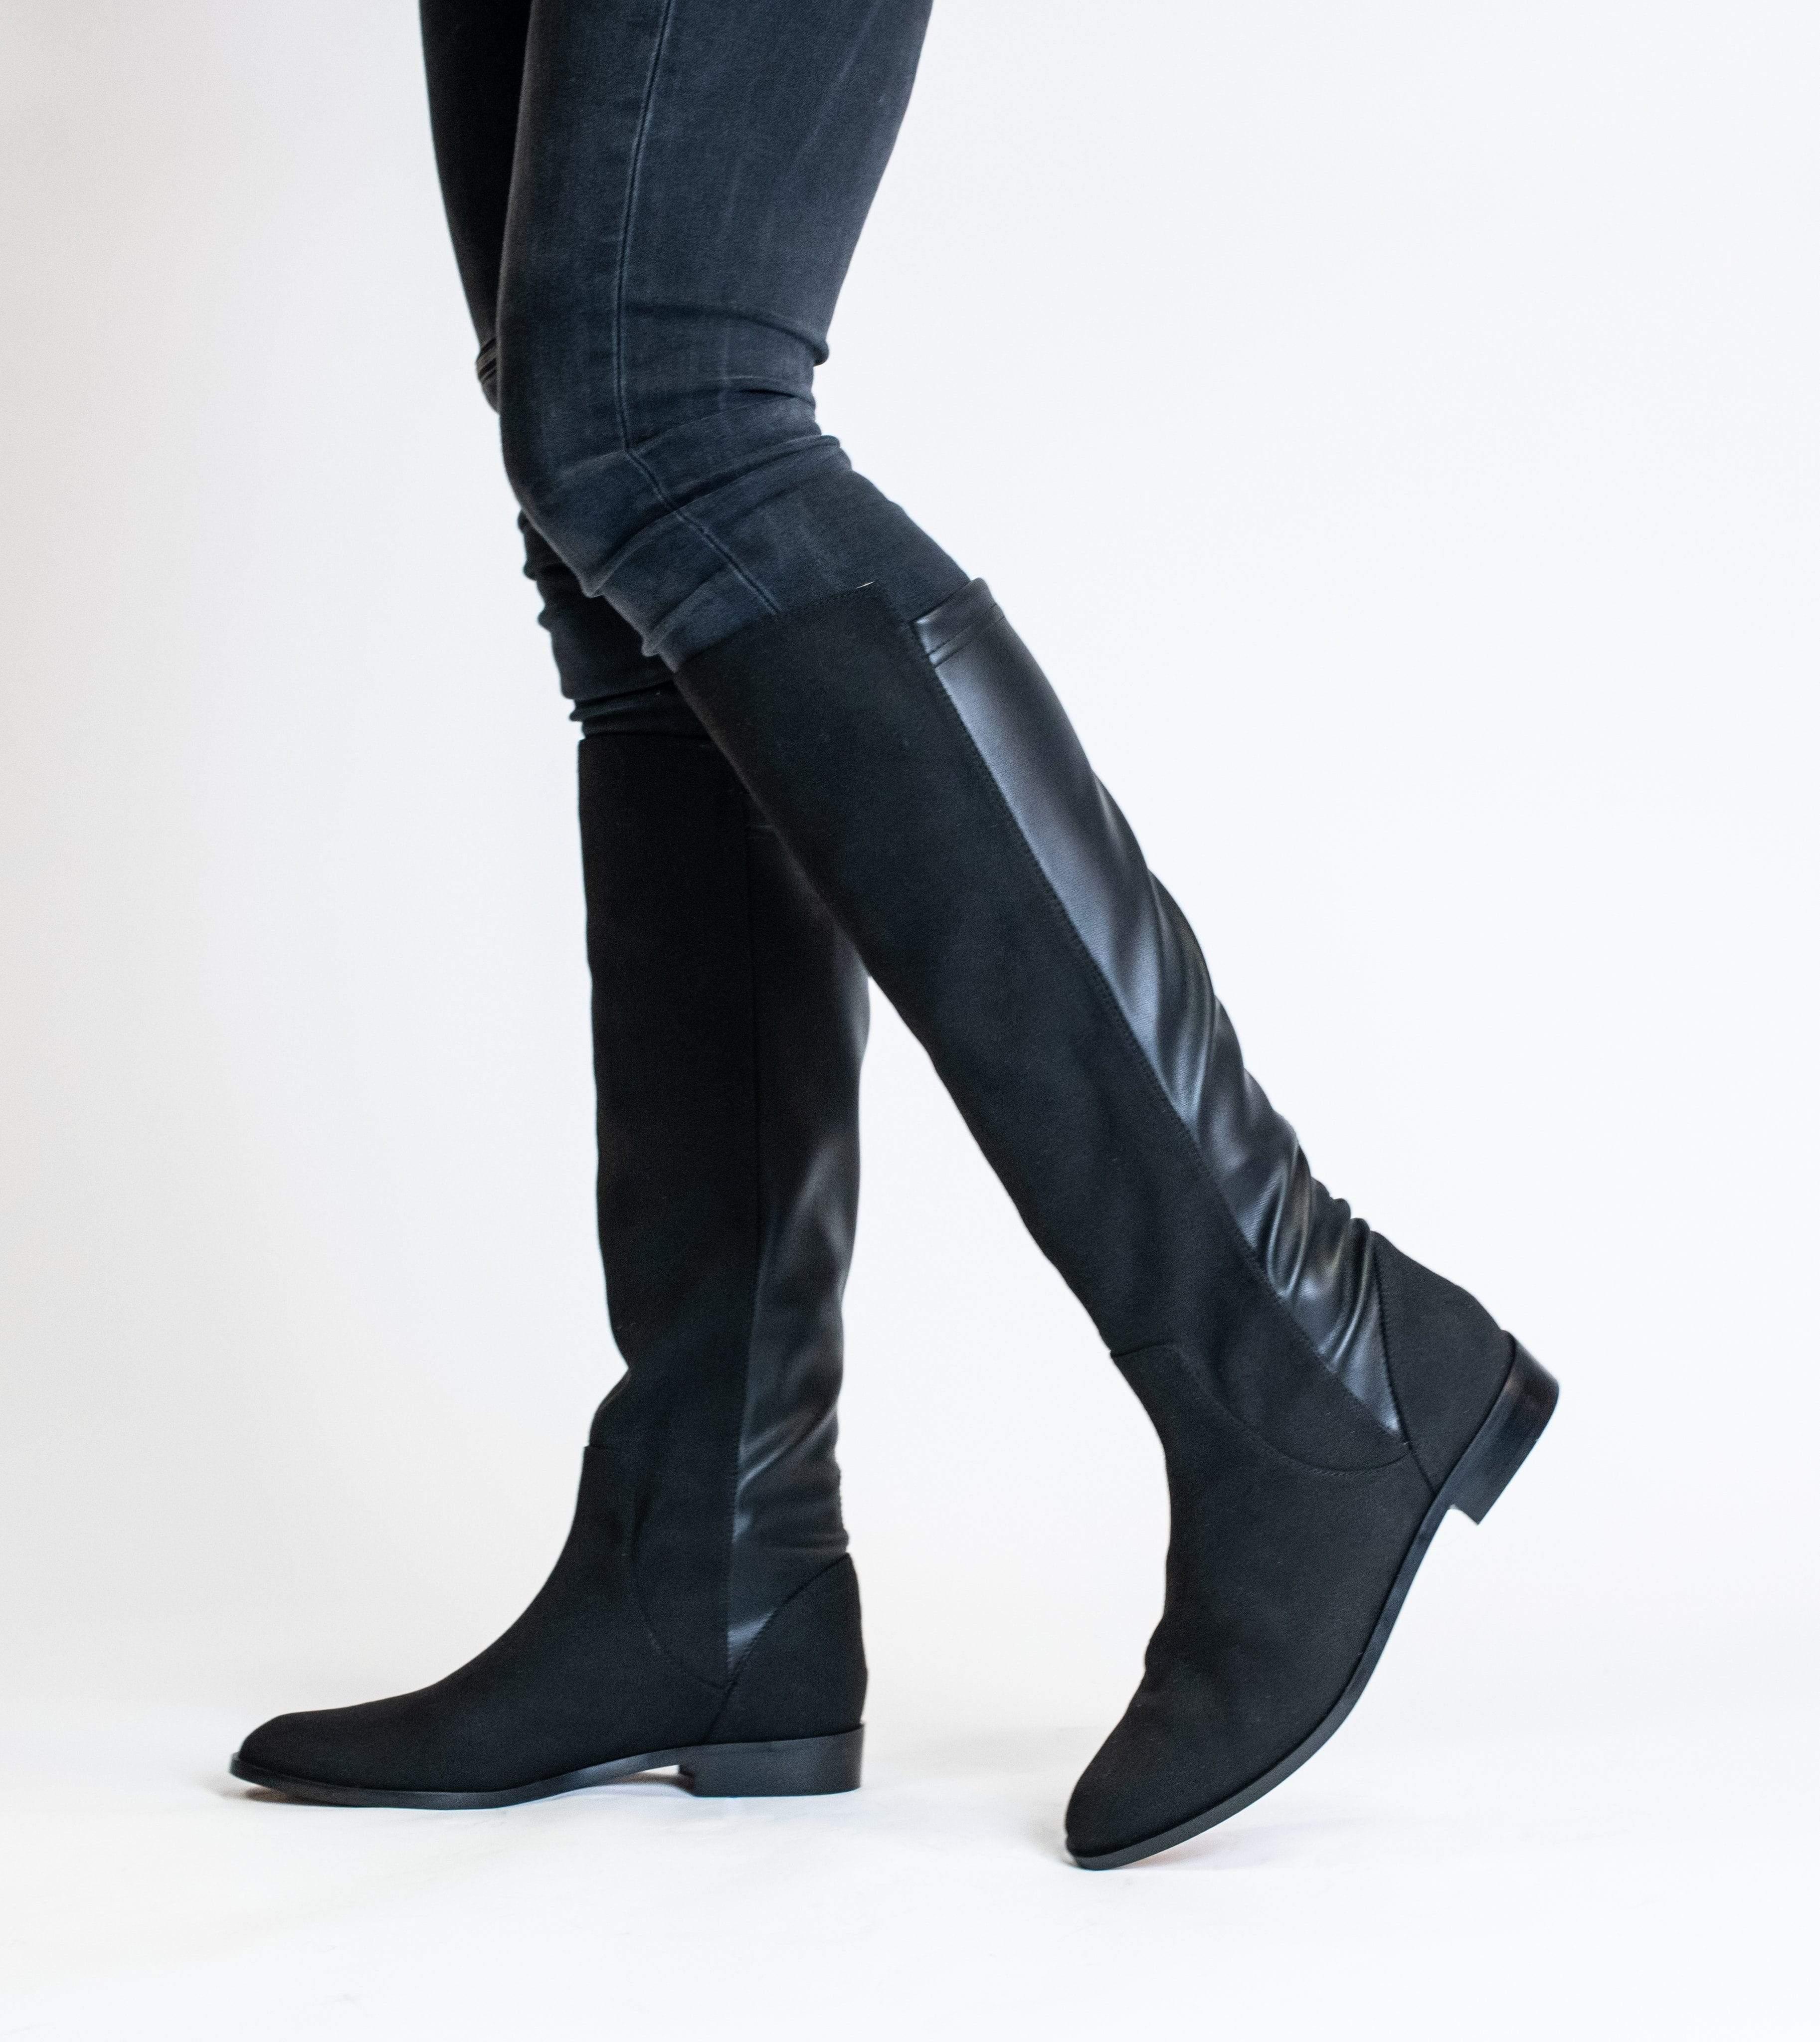 Allkind Grace Two Tone Vegan Long Flat Boots | Black